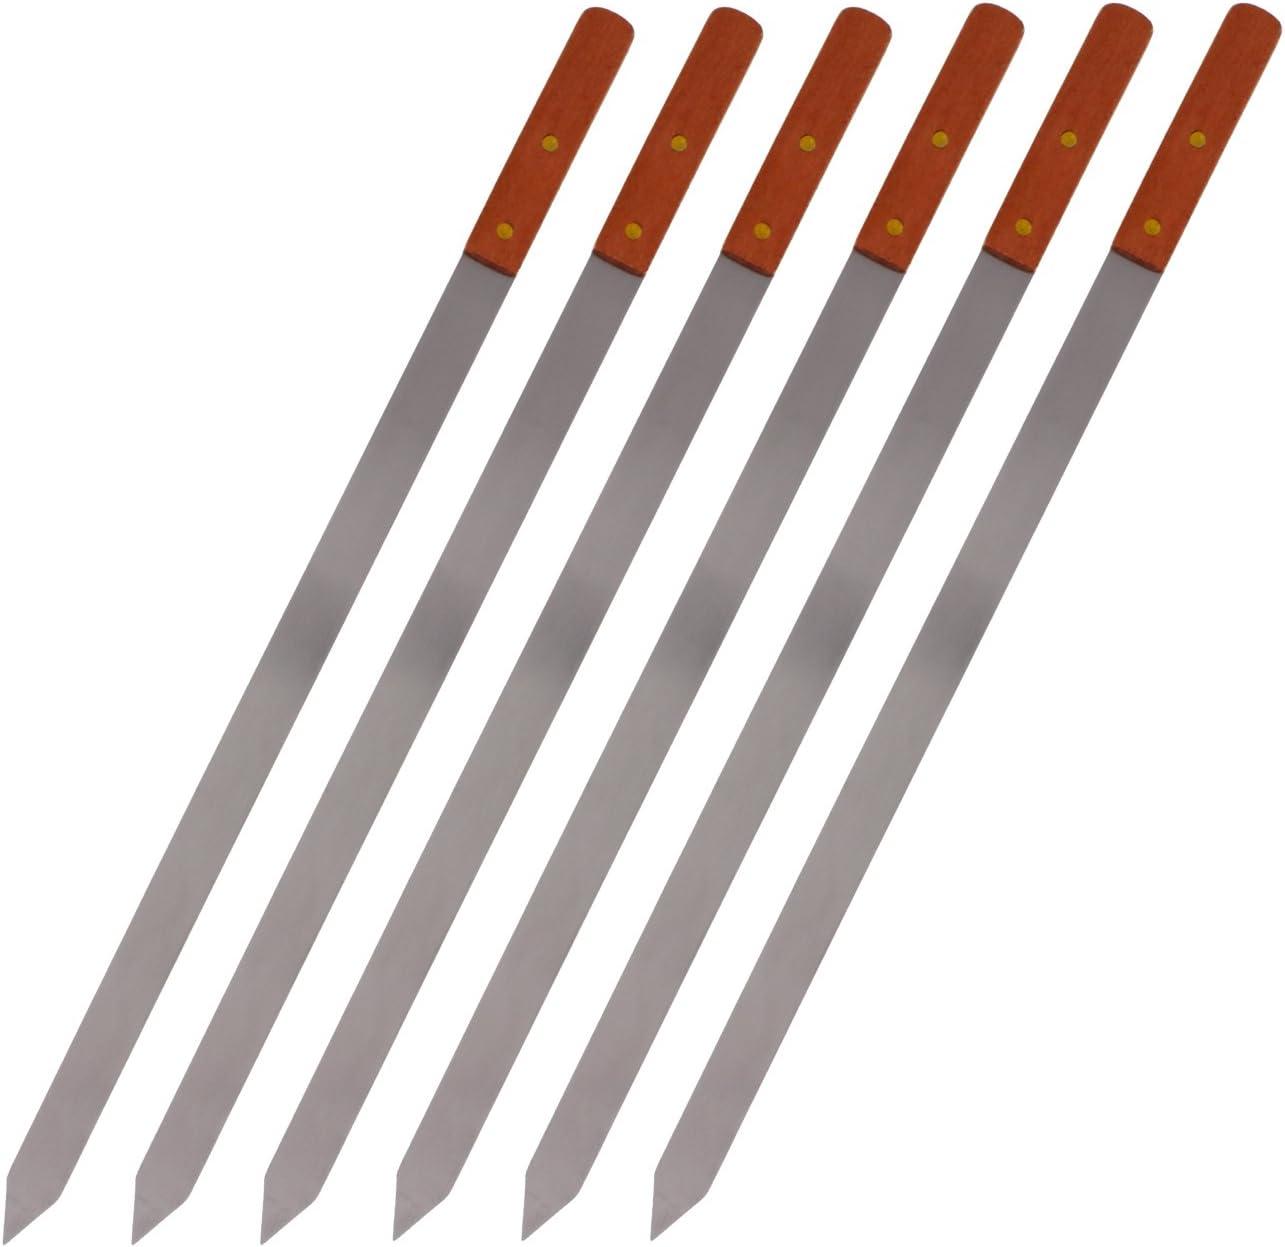 CHEFTOR Premium Stainless Steel Wooden Handle BBQ Skewers for Shish Kebab, Turkish Grills & Koubideh, Brazilian-Style BBQ, 23 Inch x 1 Inch, Set of 6